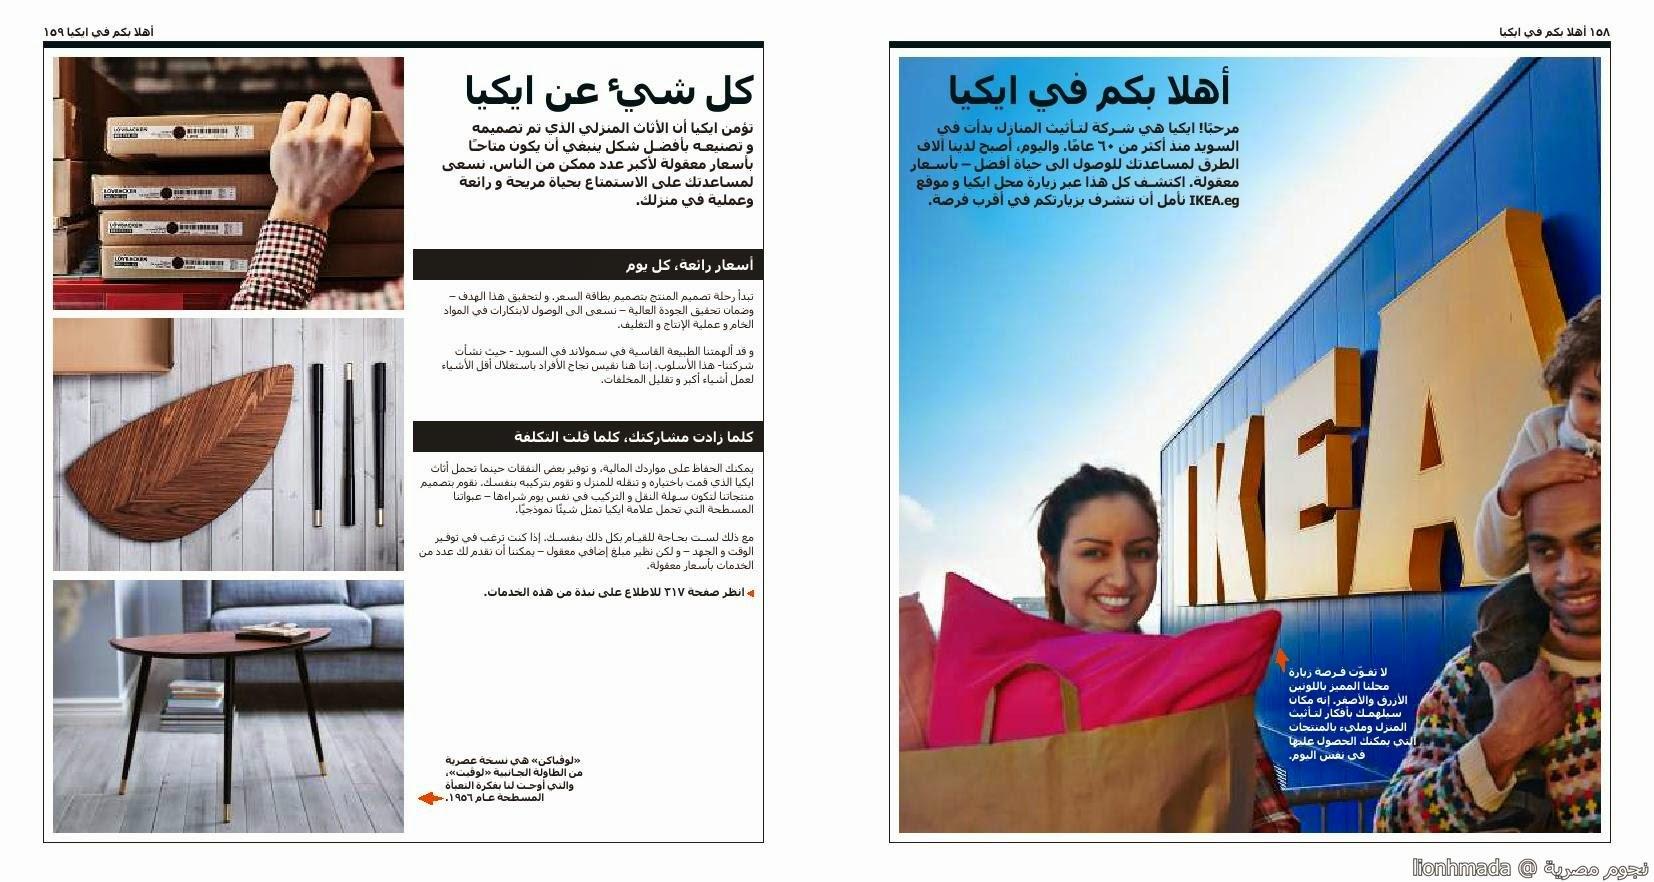 img3a54dbdeebe47558edc646274a15bb61 صور كتالوج ايكيا مصر ikia للديكورات